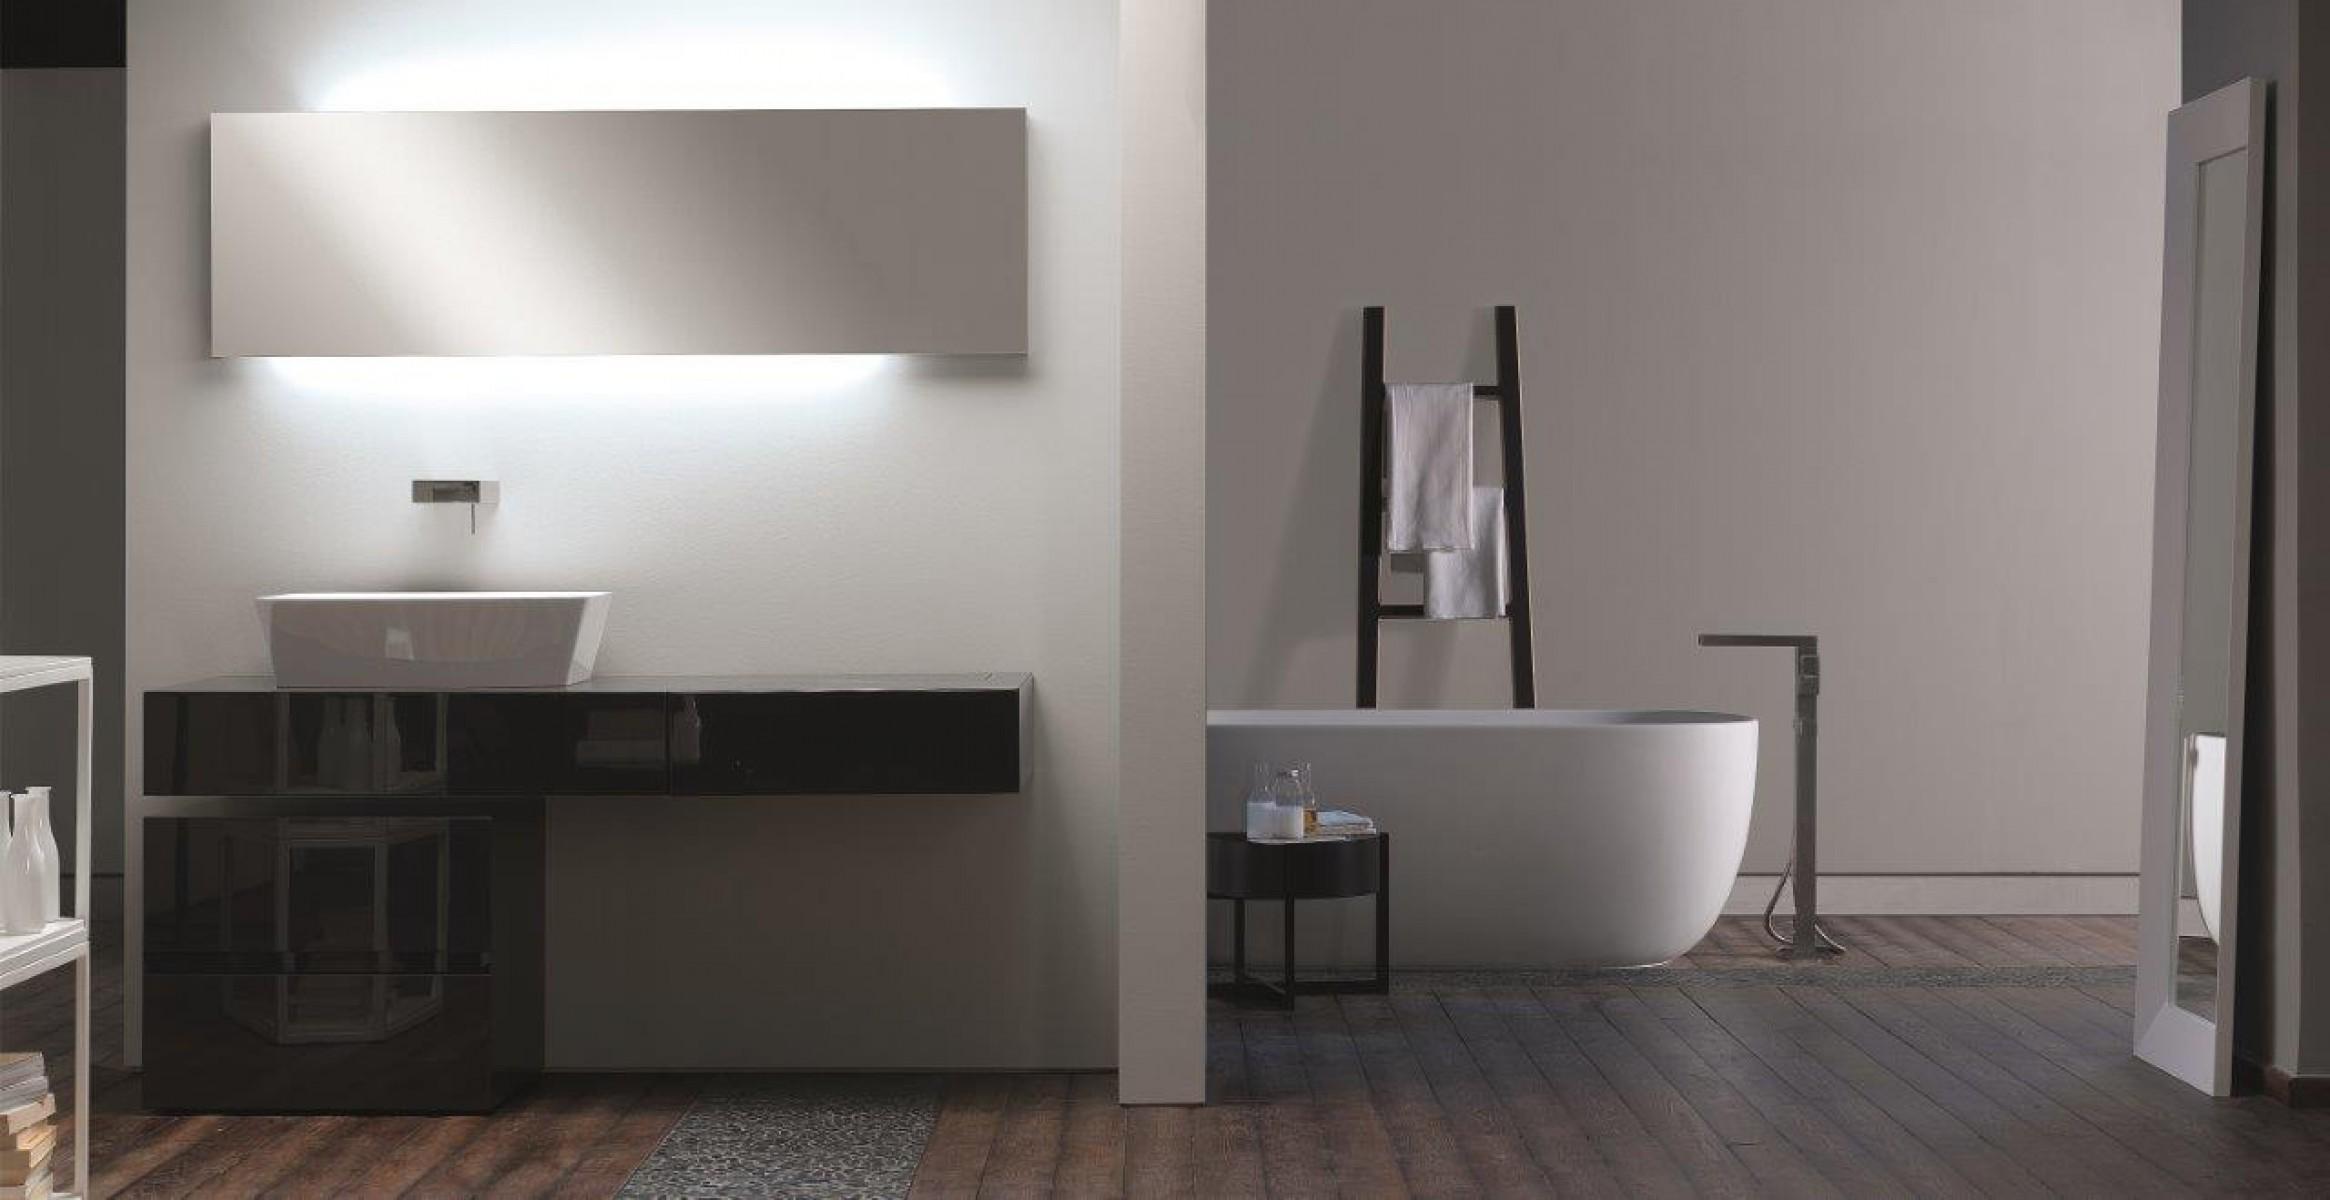 Ital Designs Hong Kong ultra modern italian bathroom design